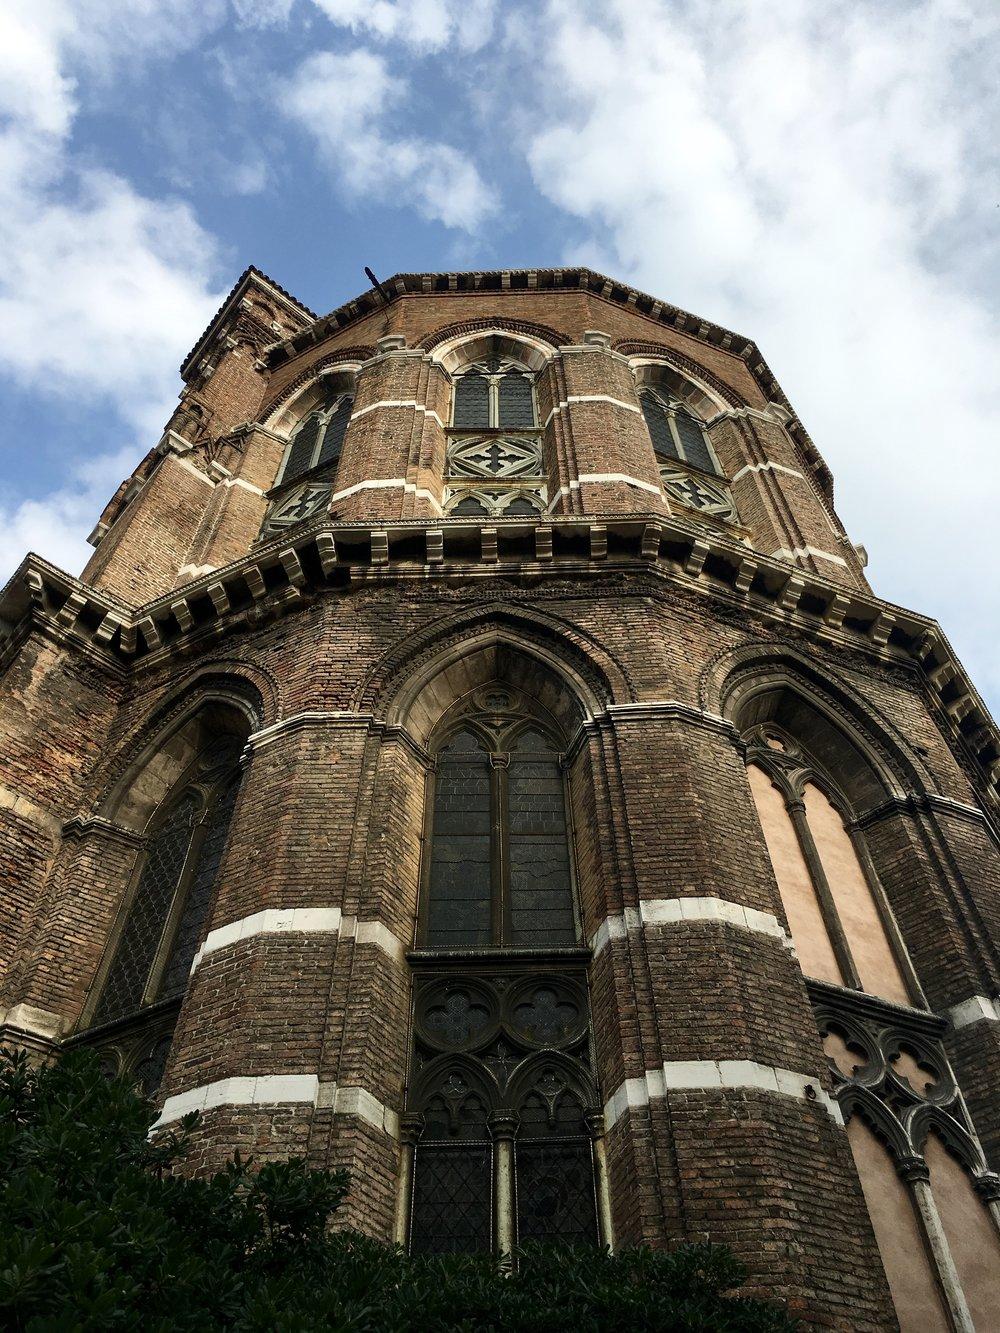 Basilica Dei Frari, Venice, Italy, Samantha McNeil